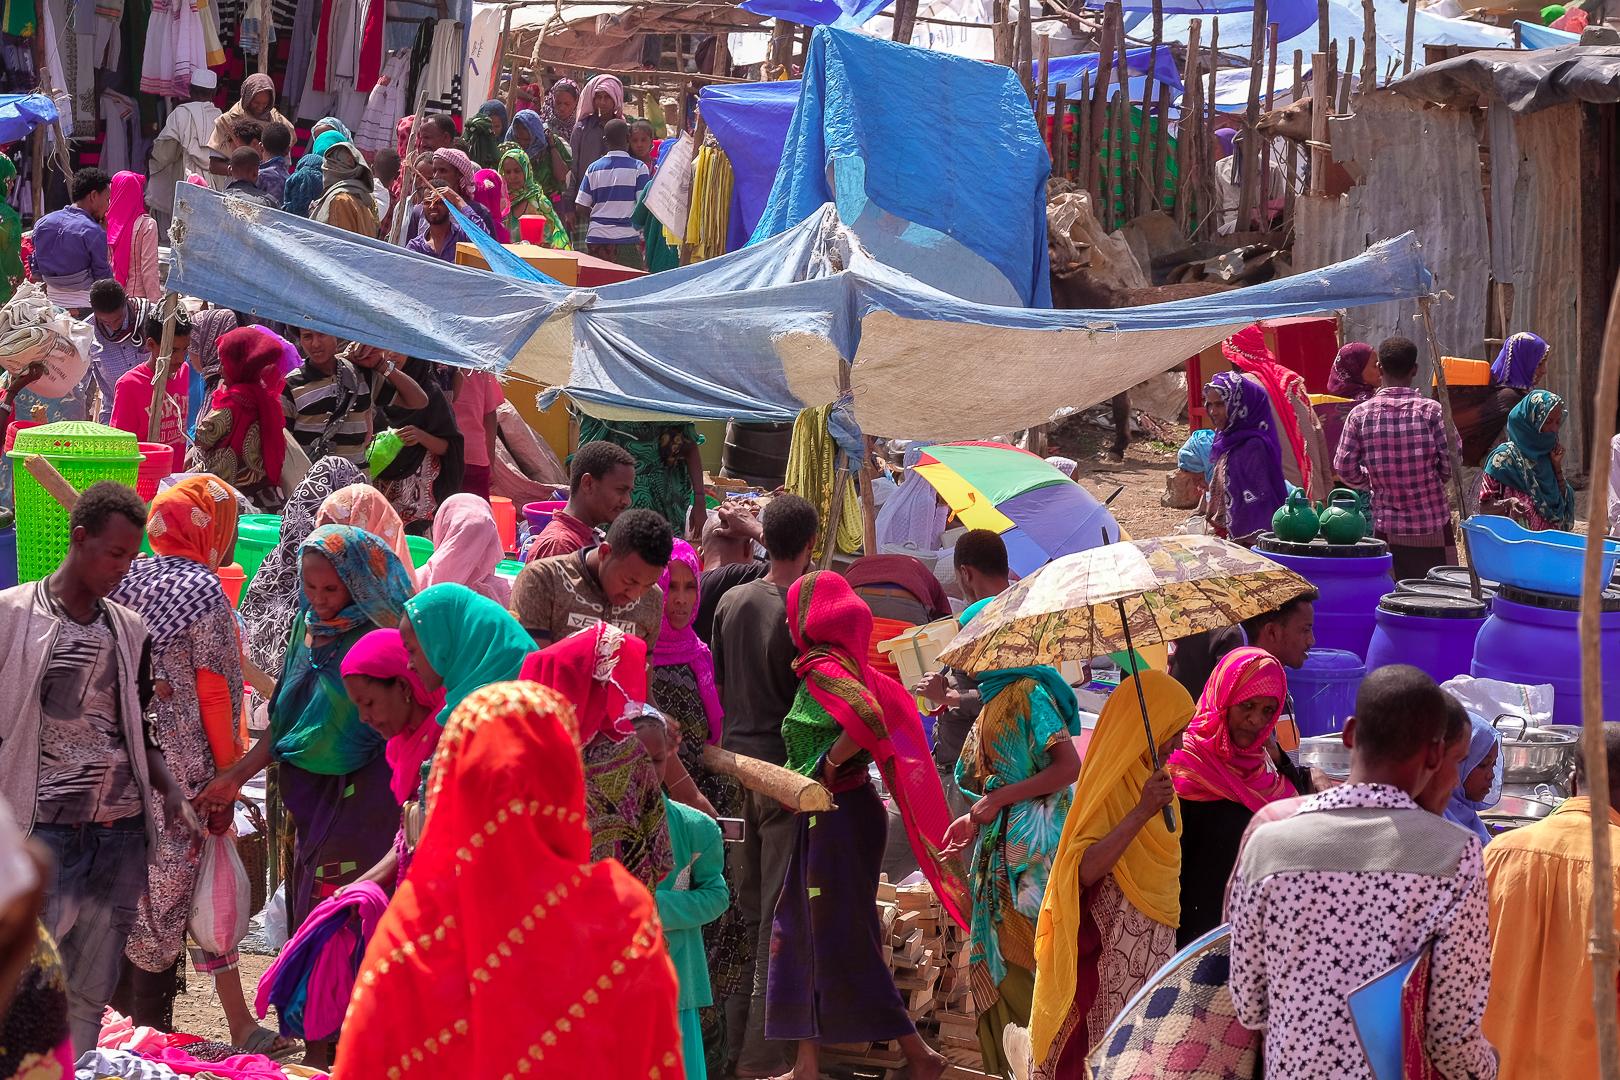 Weekly market in Bati, Ethiopia